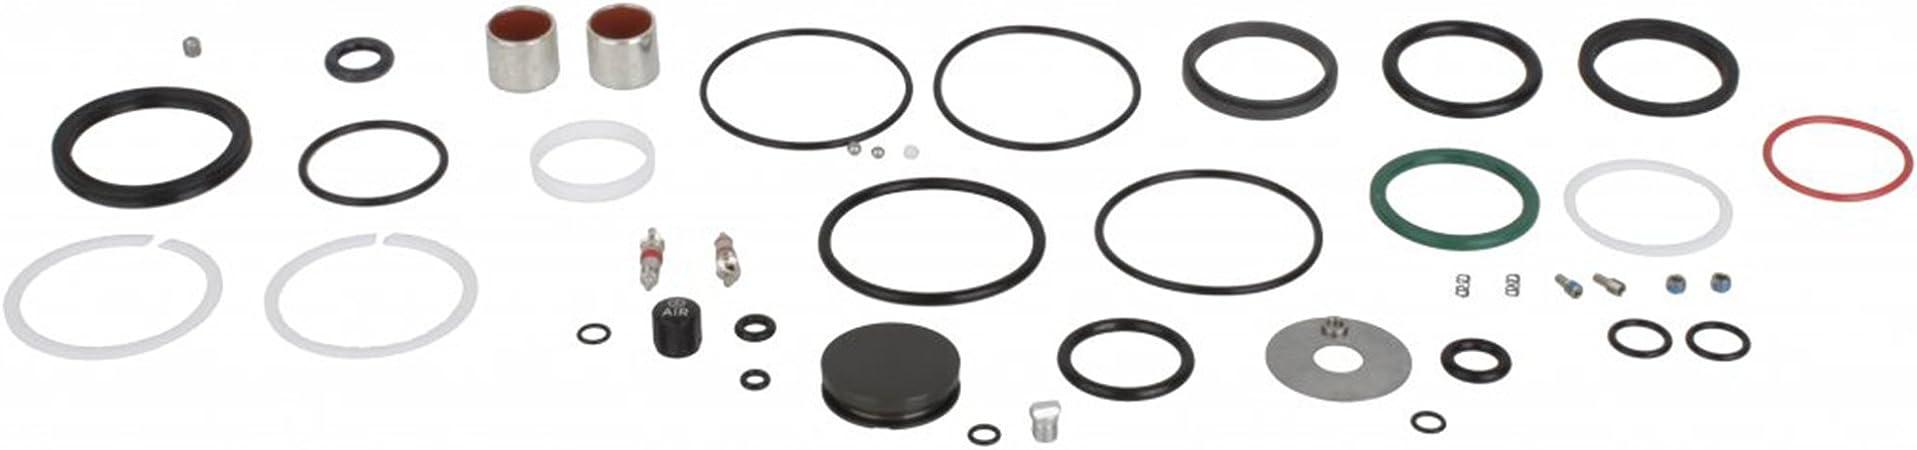 Full Service Kits Monarch with Autosag, RockShox Rear Shock Service Kit Full